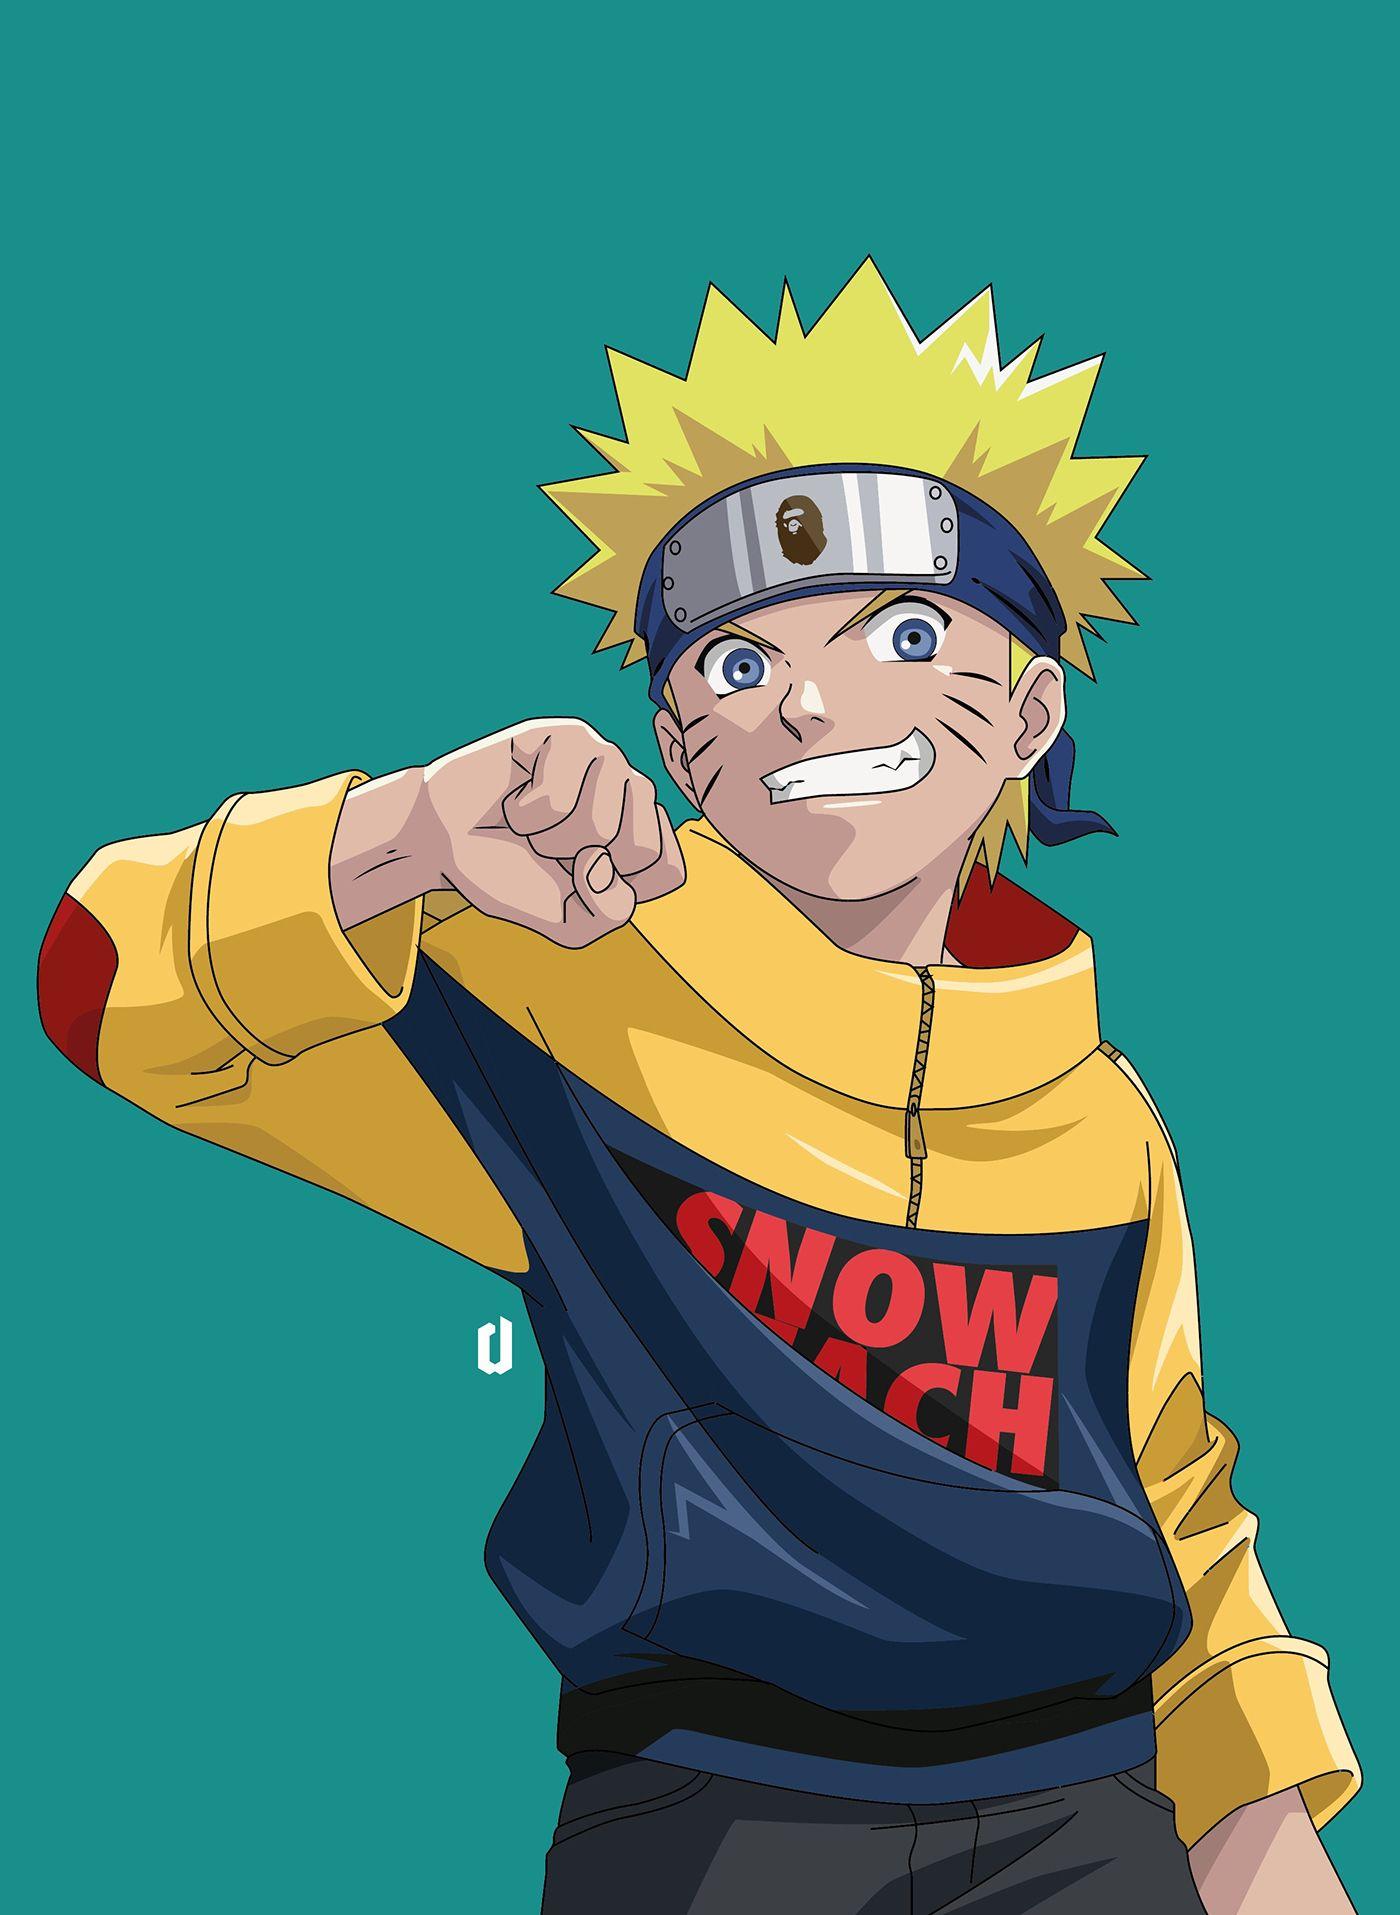 Showcase And Discover Creative Work On The World S Leading Online Platform For Naruto Uzumaki Art Naruto Supreme Anime Naruto